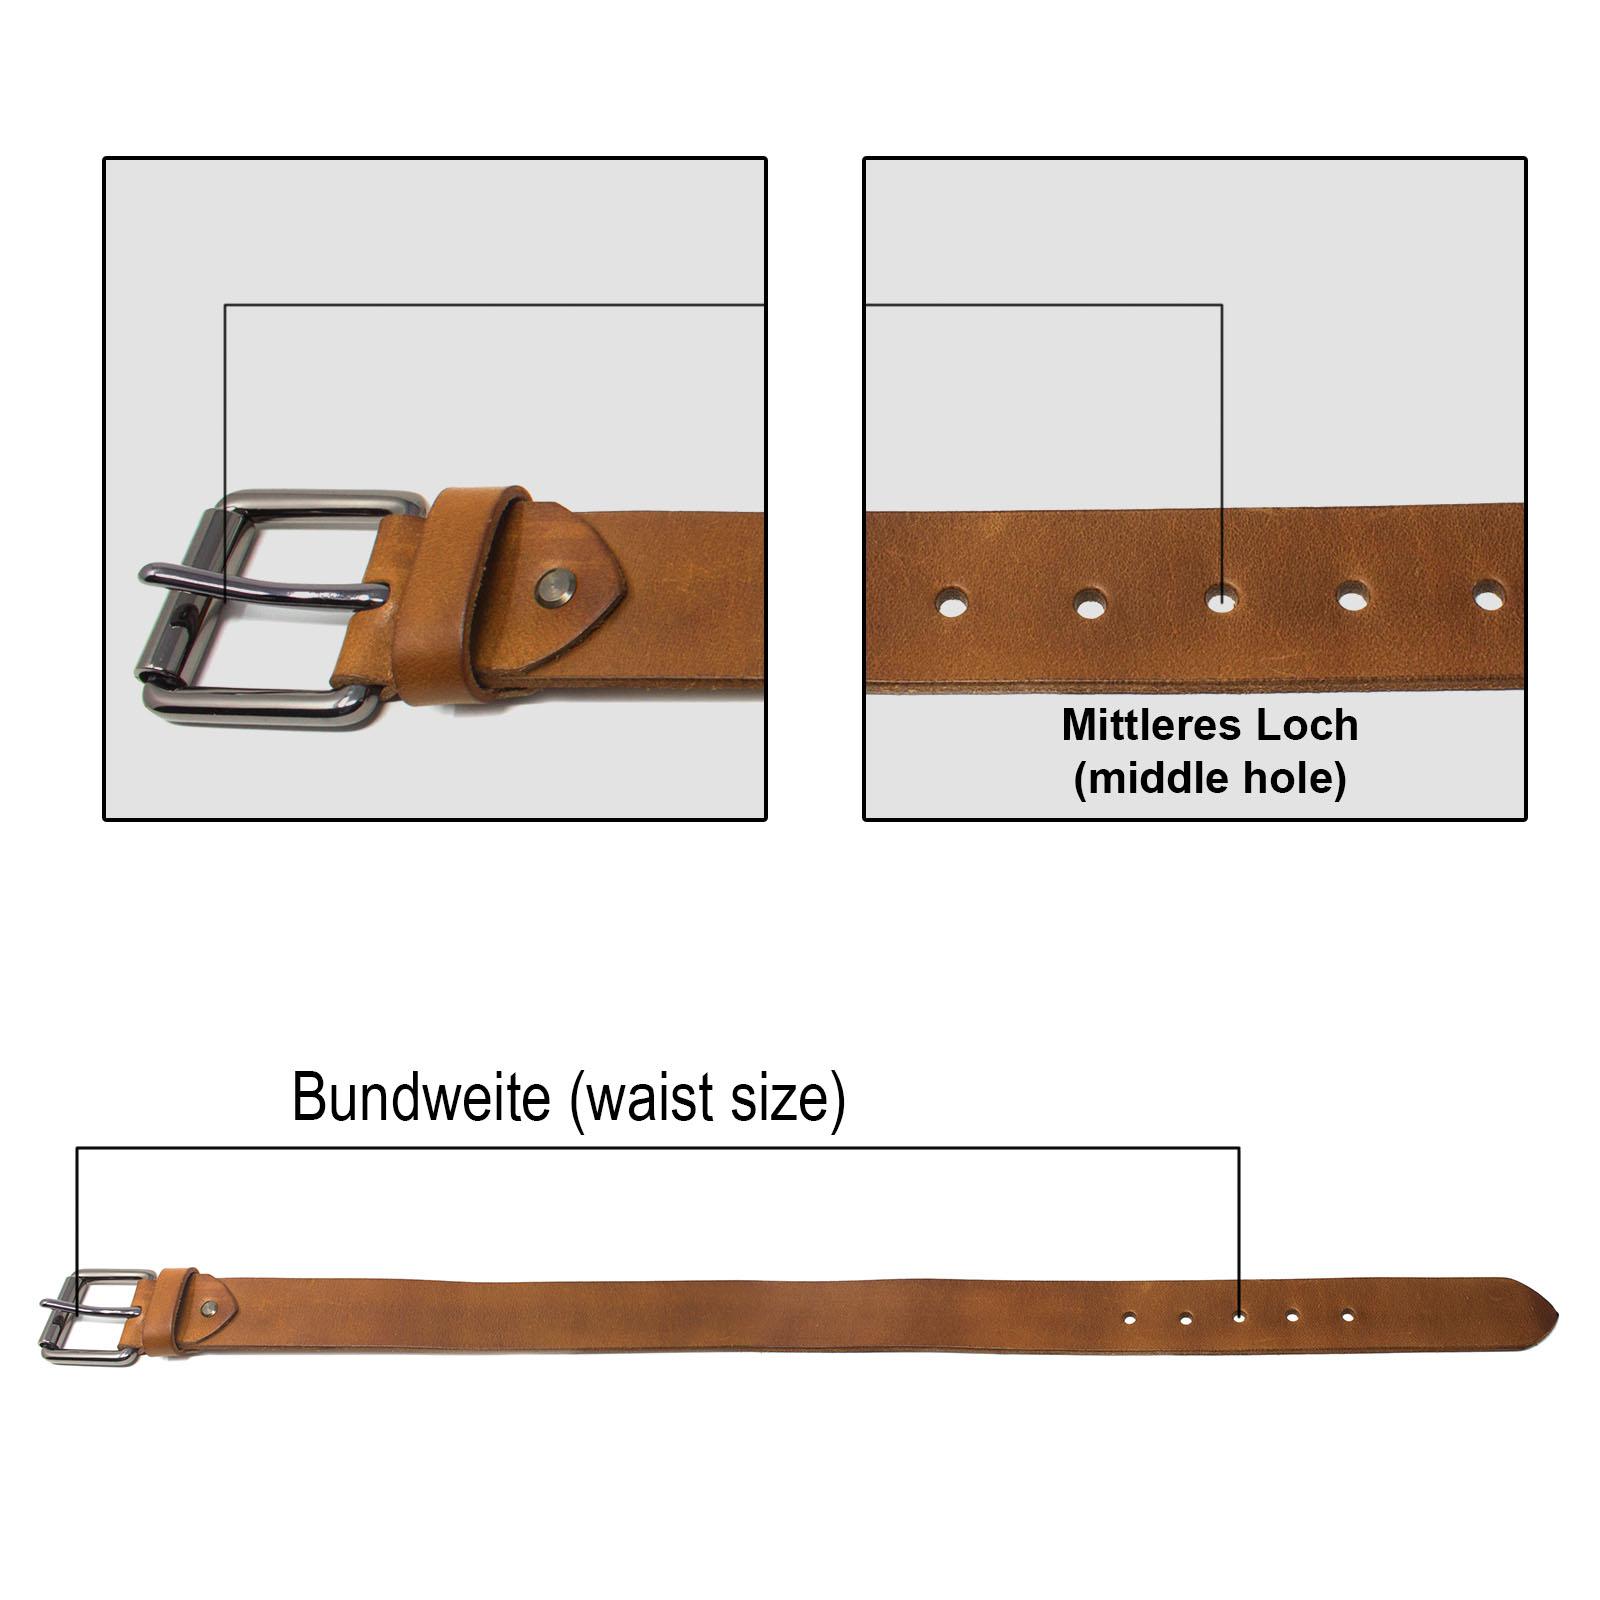 73d80f2a71fc9 ROYALZ Ledergürtel Herren aus robusten 4mm Büffel-Leder